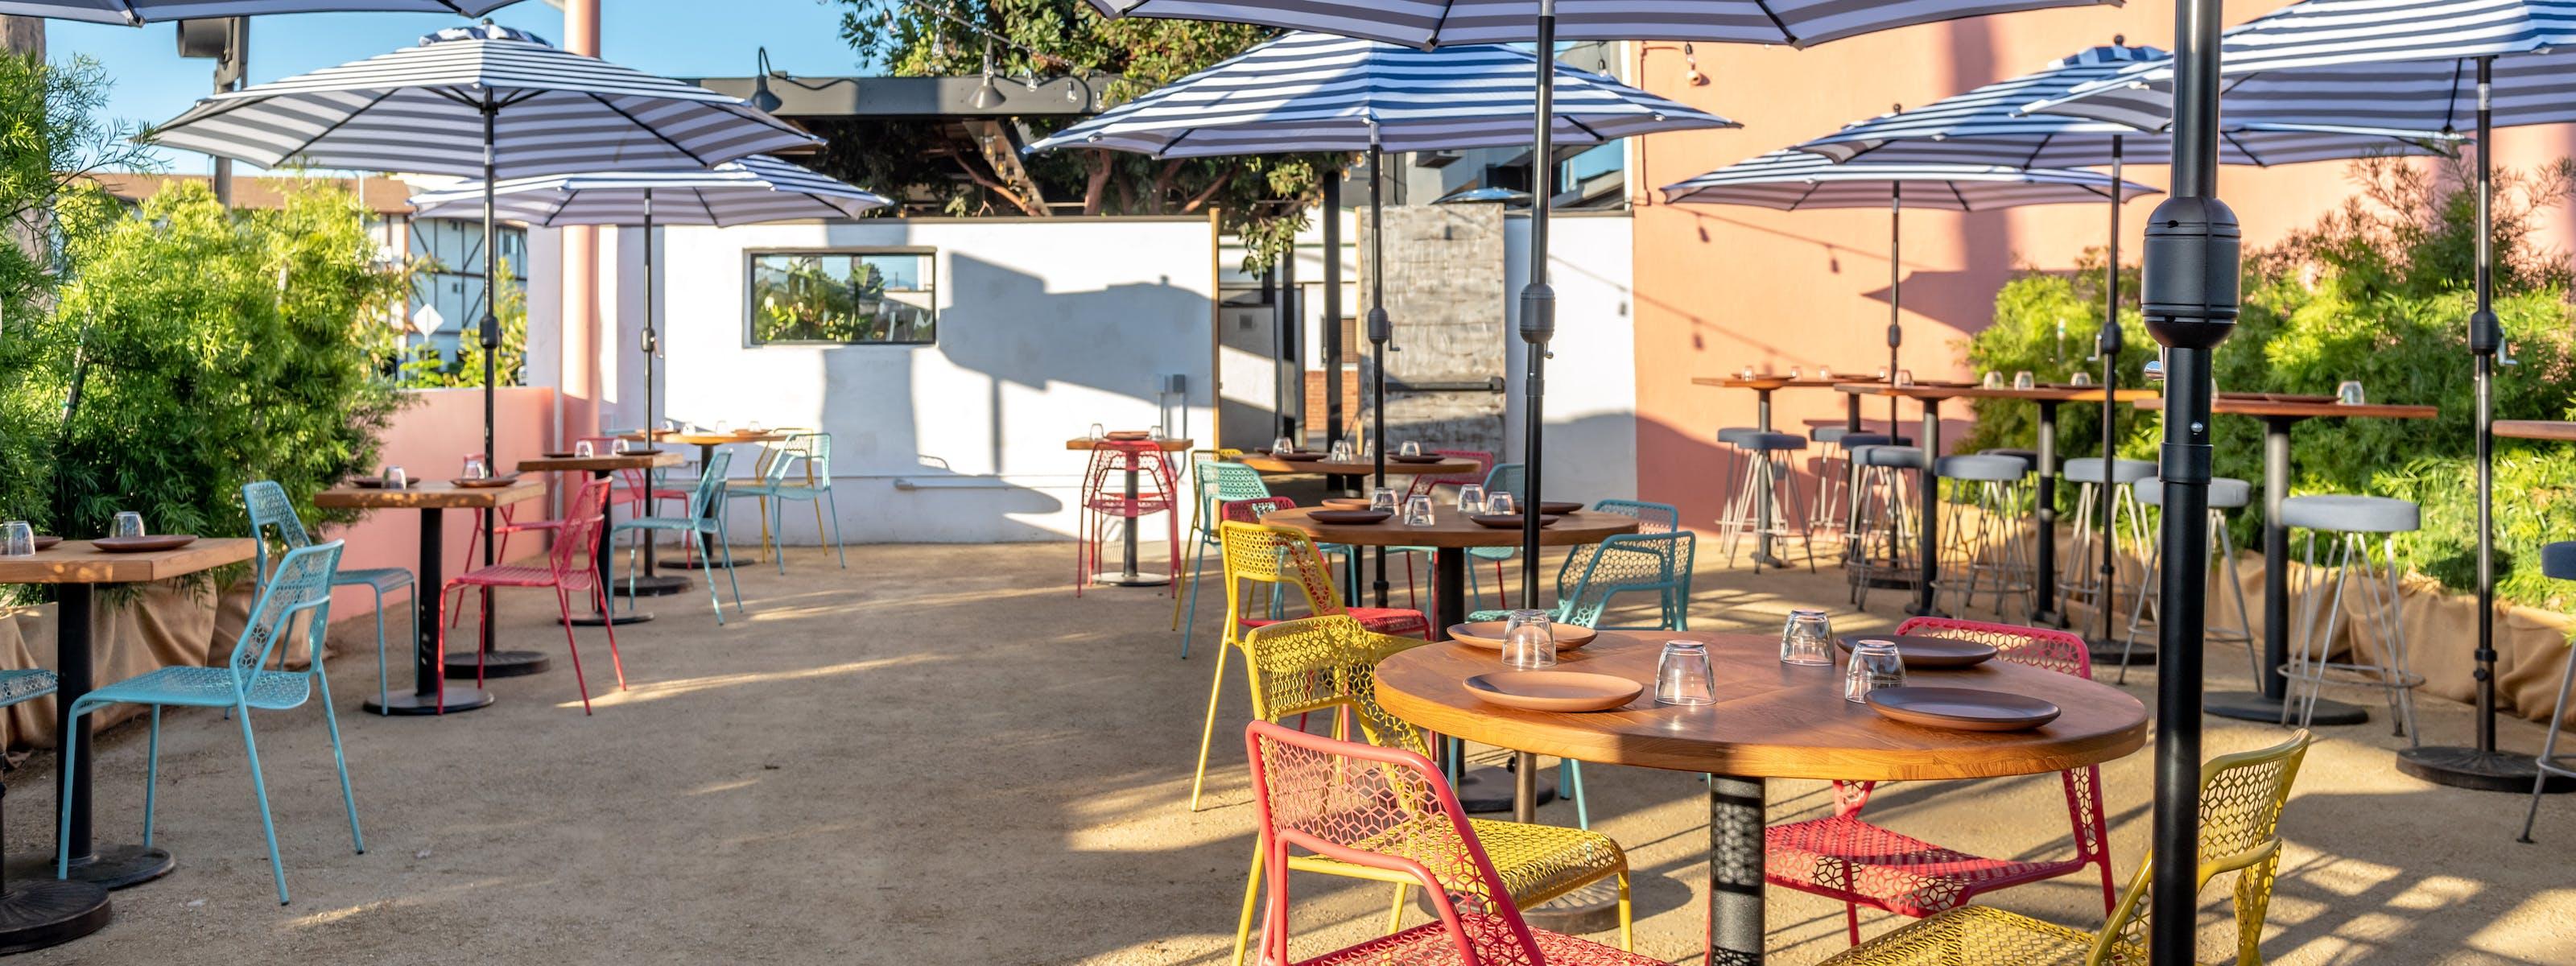 The Best Outdoor Brunch Spots In LA - Los Angeles - The Infatuation